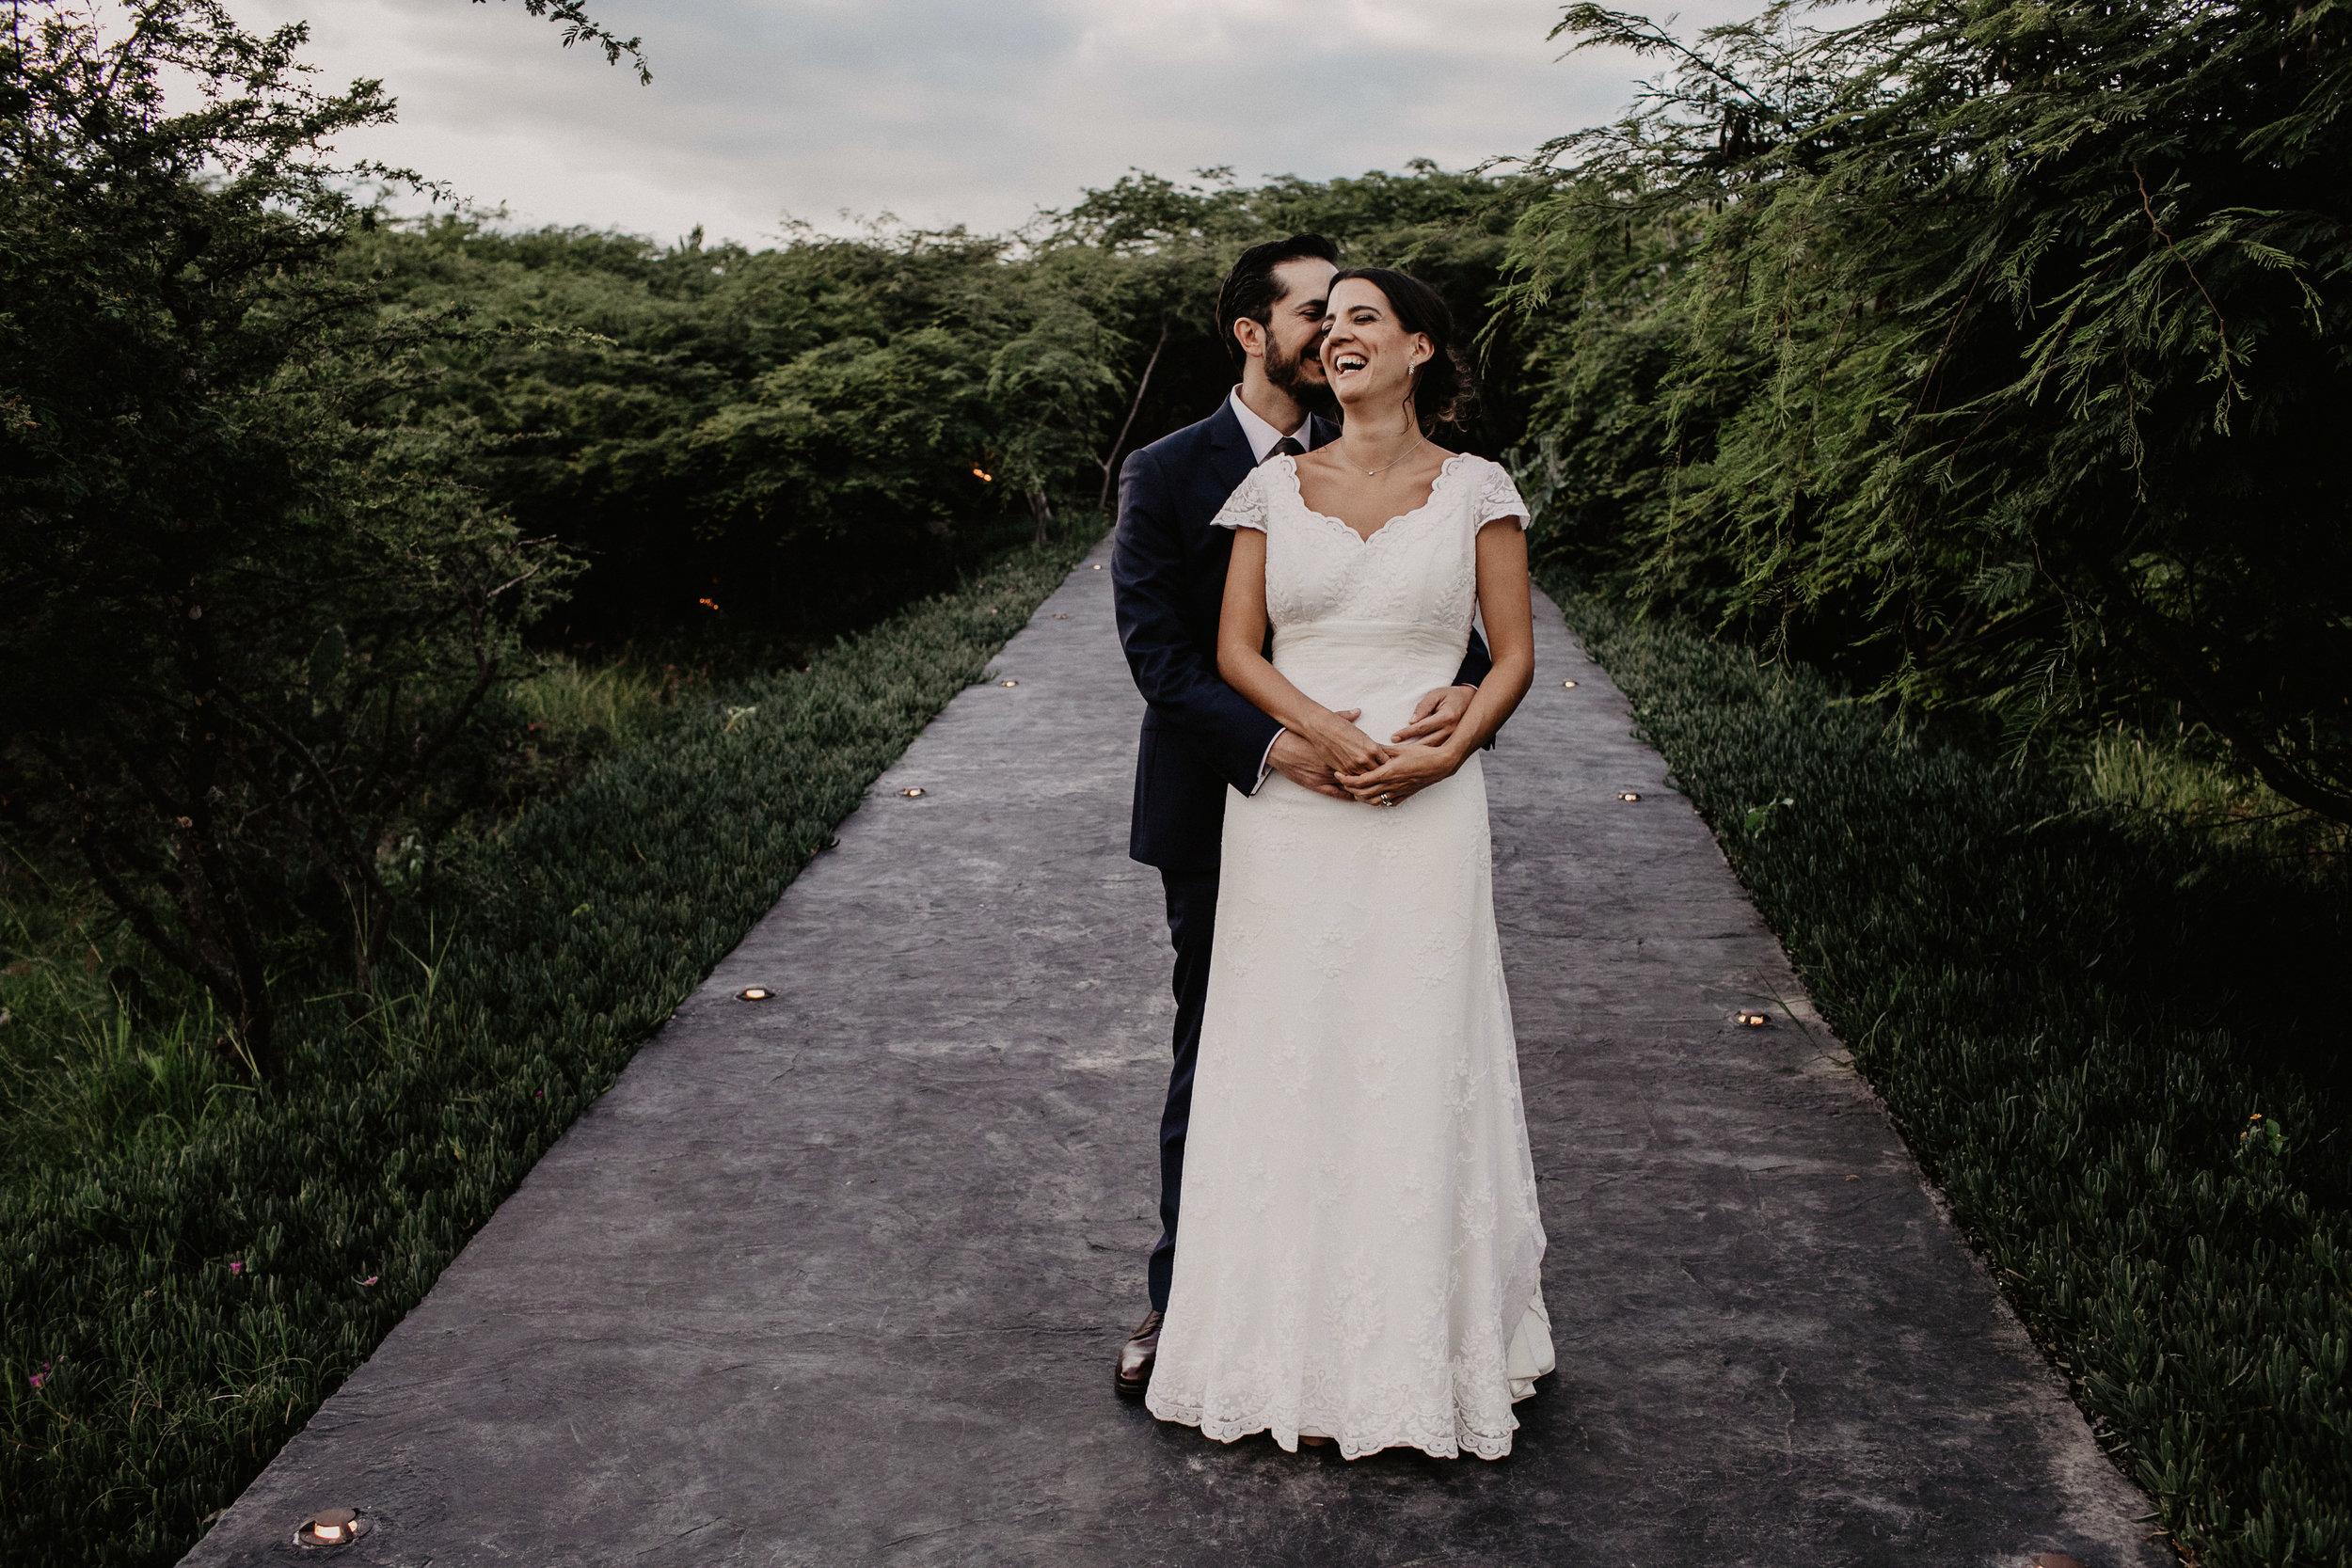 alfonso_flores_destination_wedding_photographer_pau_alonso_1036.JPG